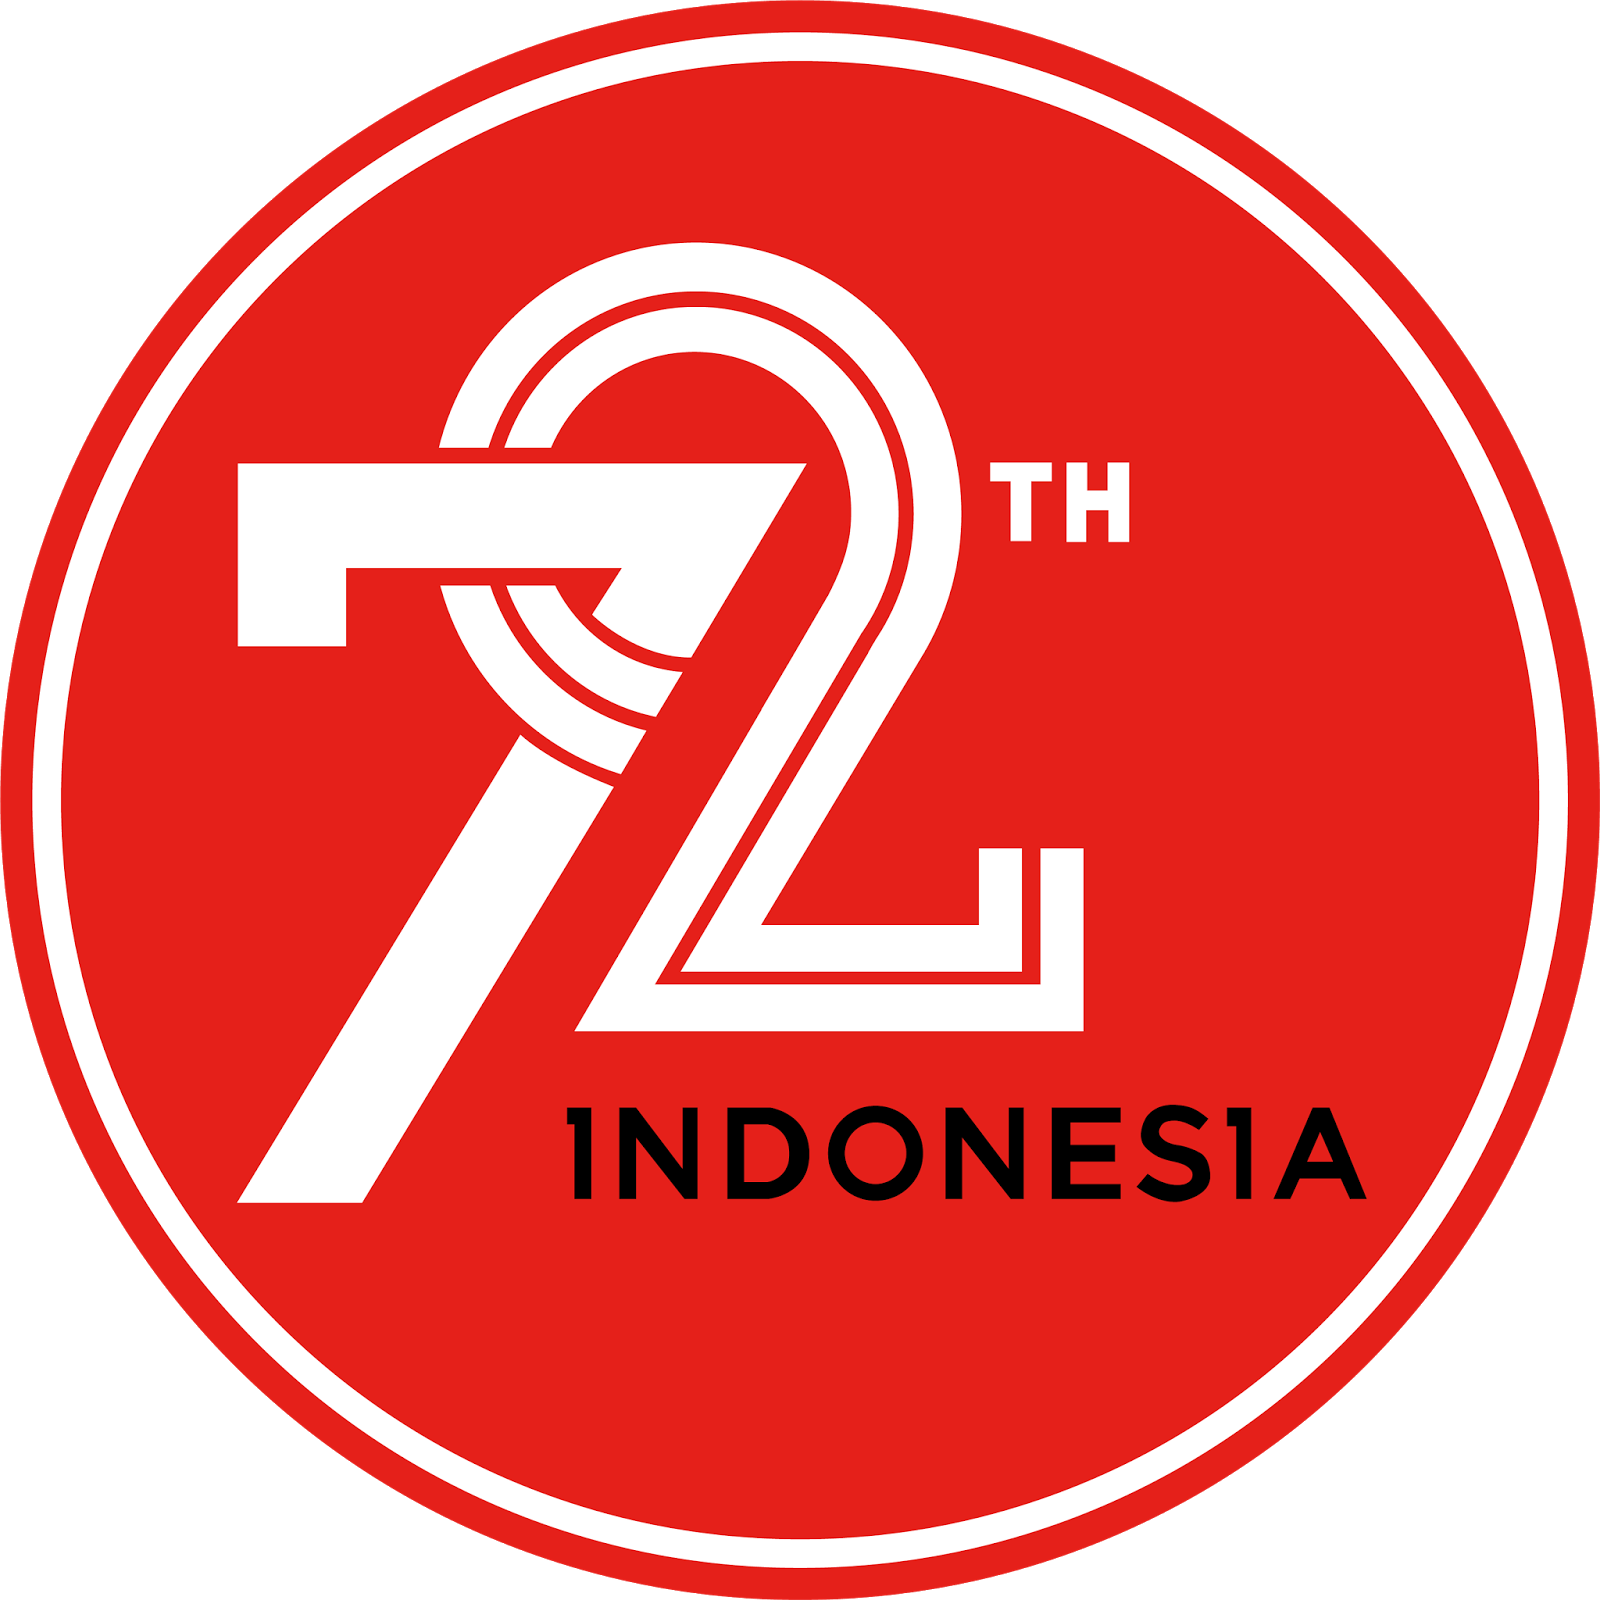 Logo Hut Ri Ke  Png